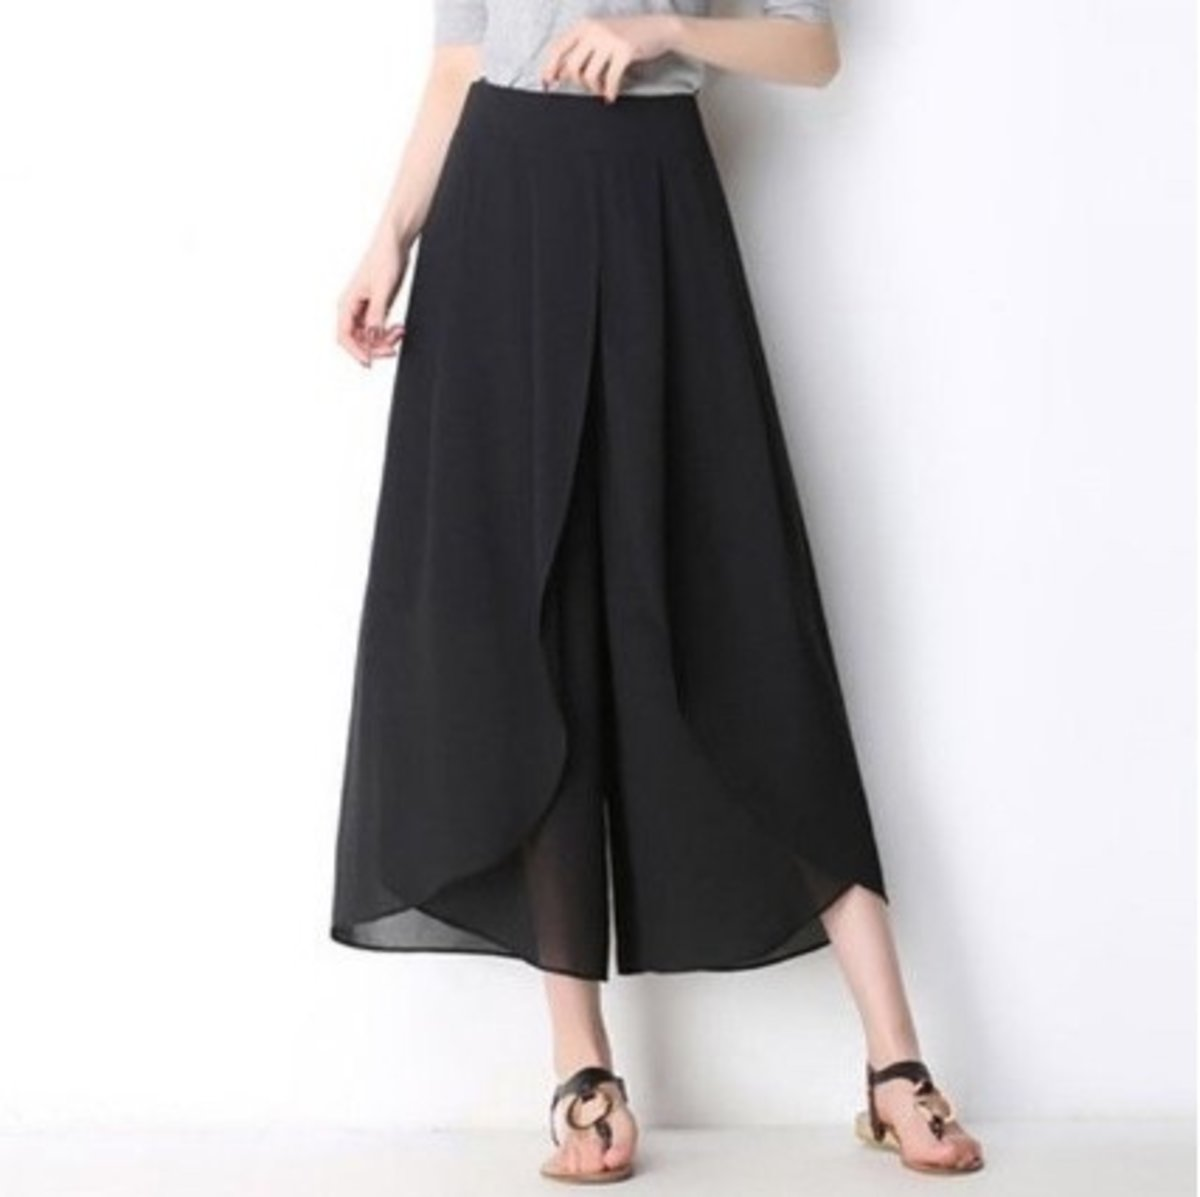 Chiffon Loose High-waist Wide Leg Style Trousers - Black